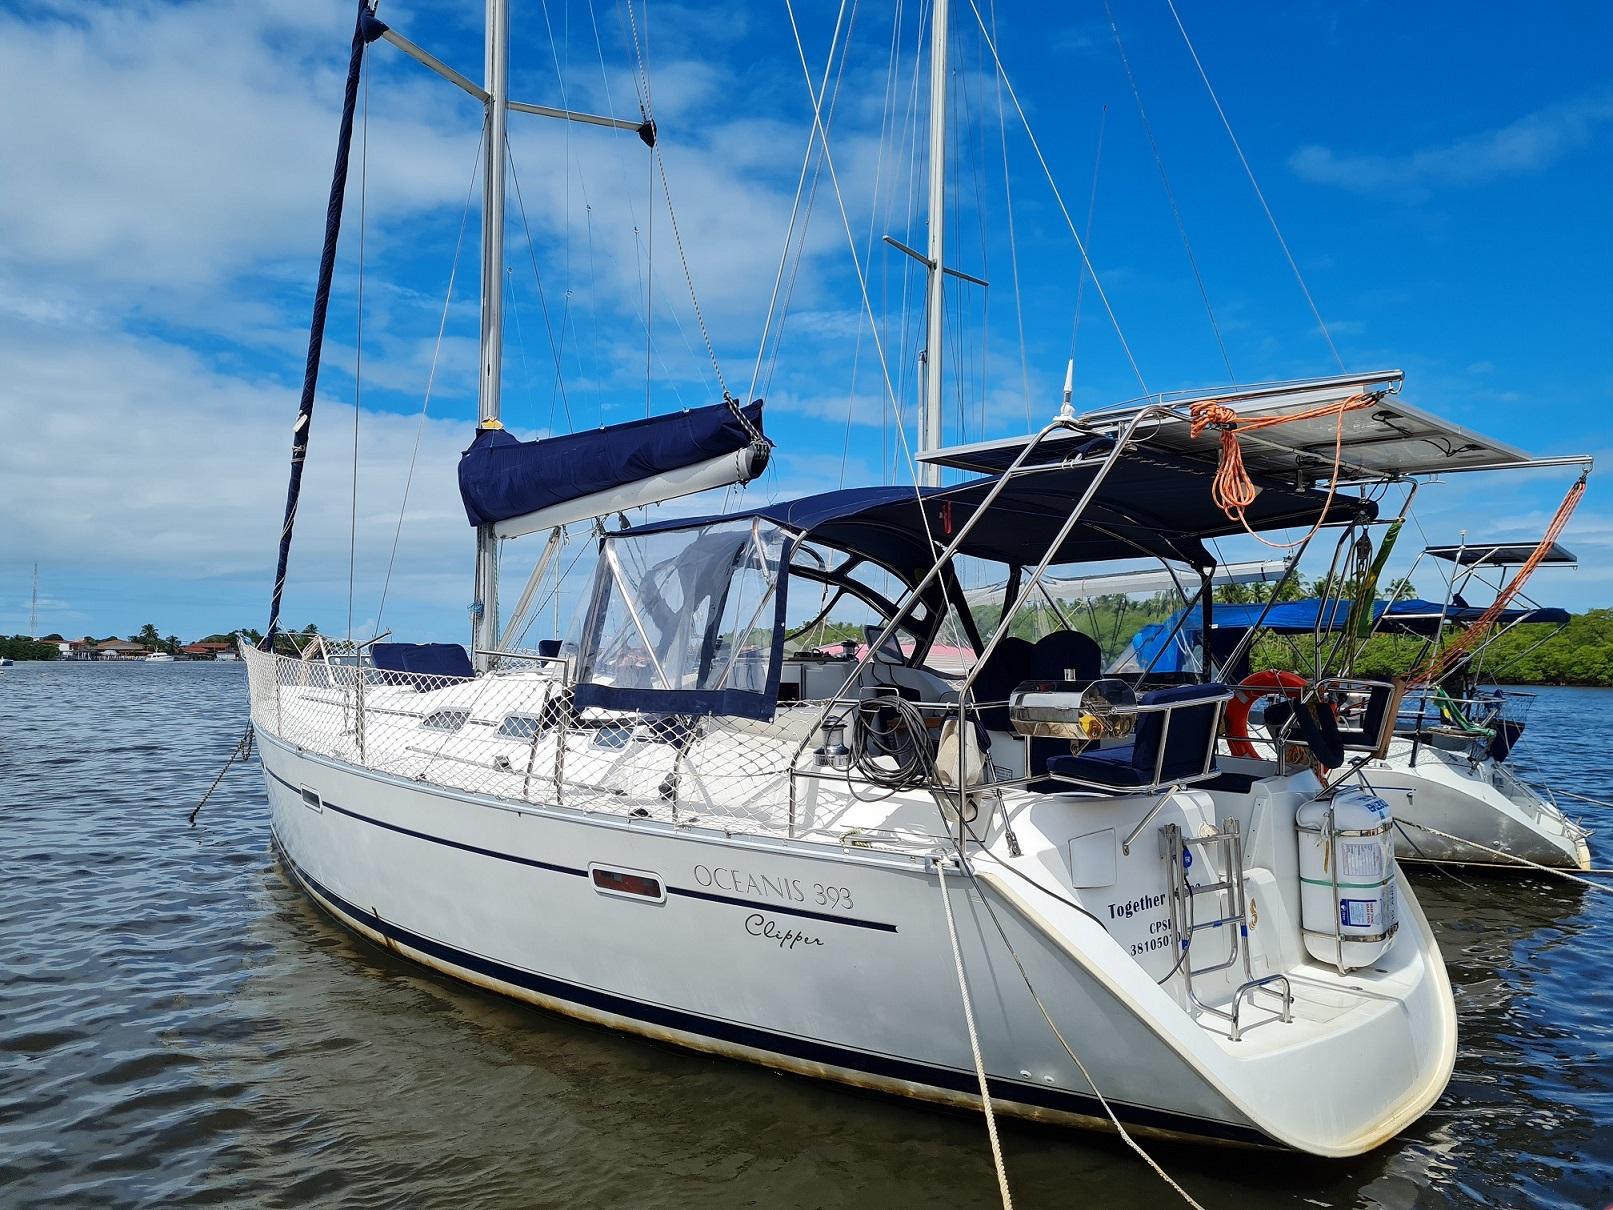 Beneteau Oceanis Cliper 393